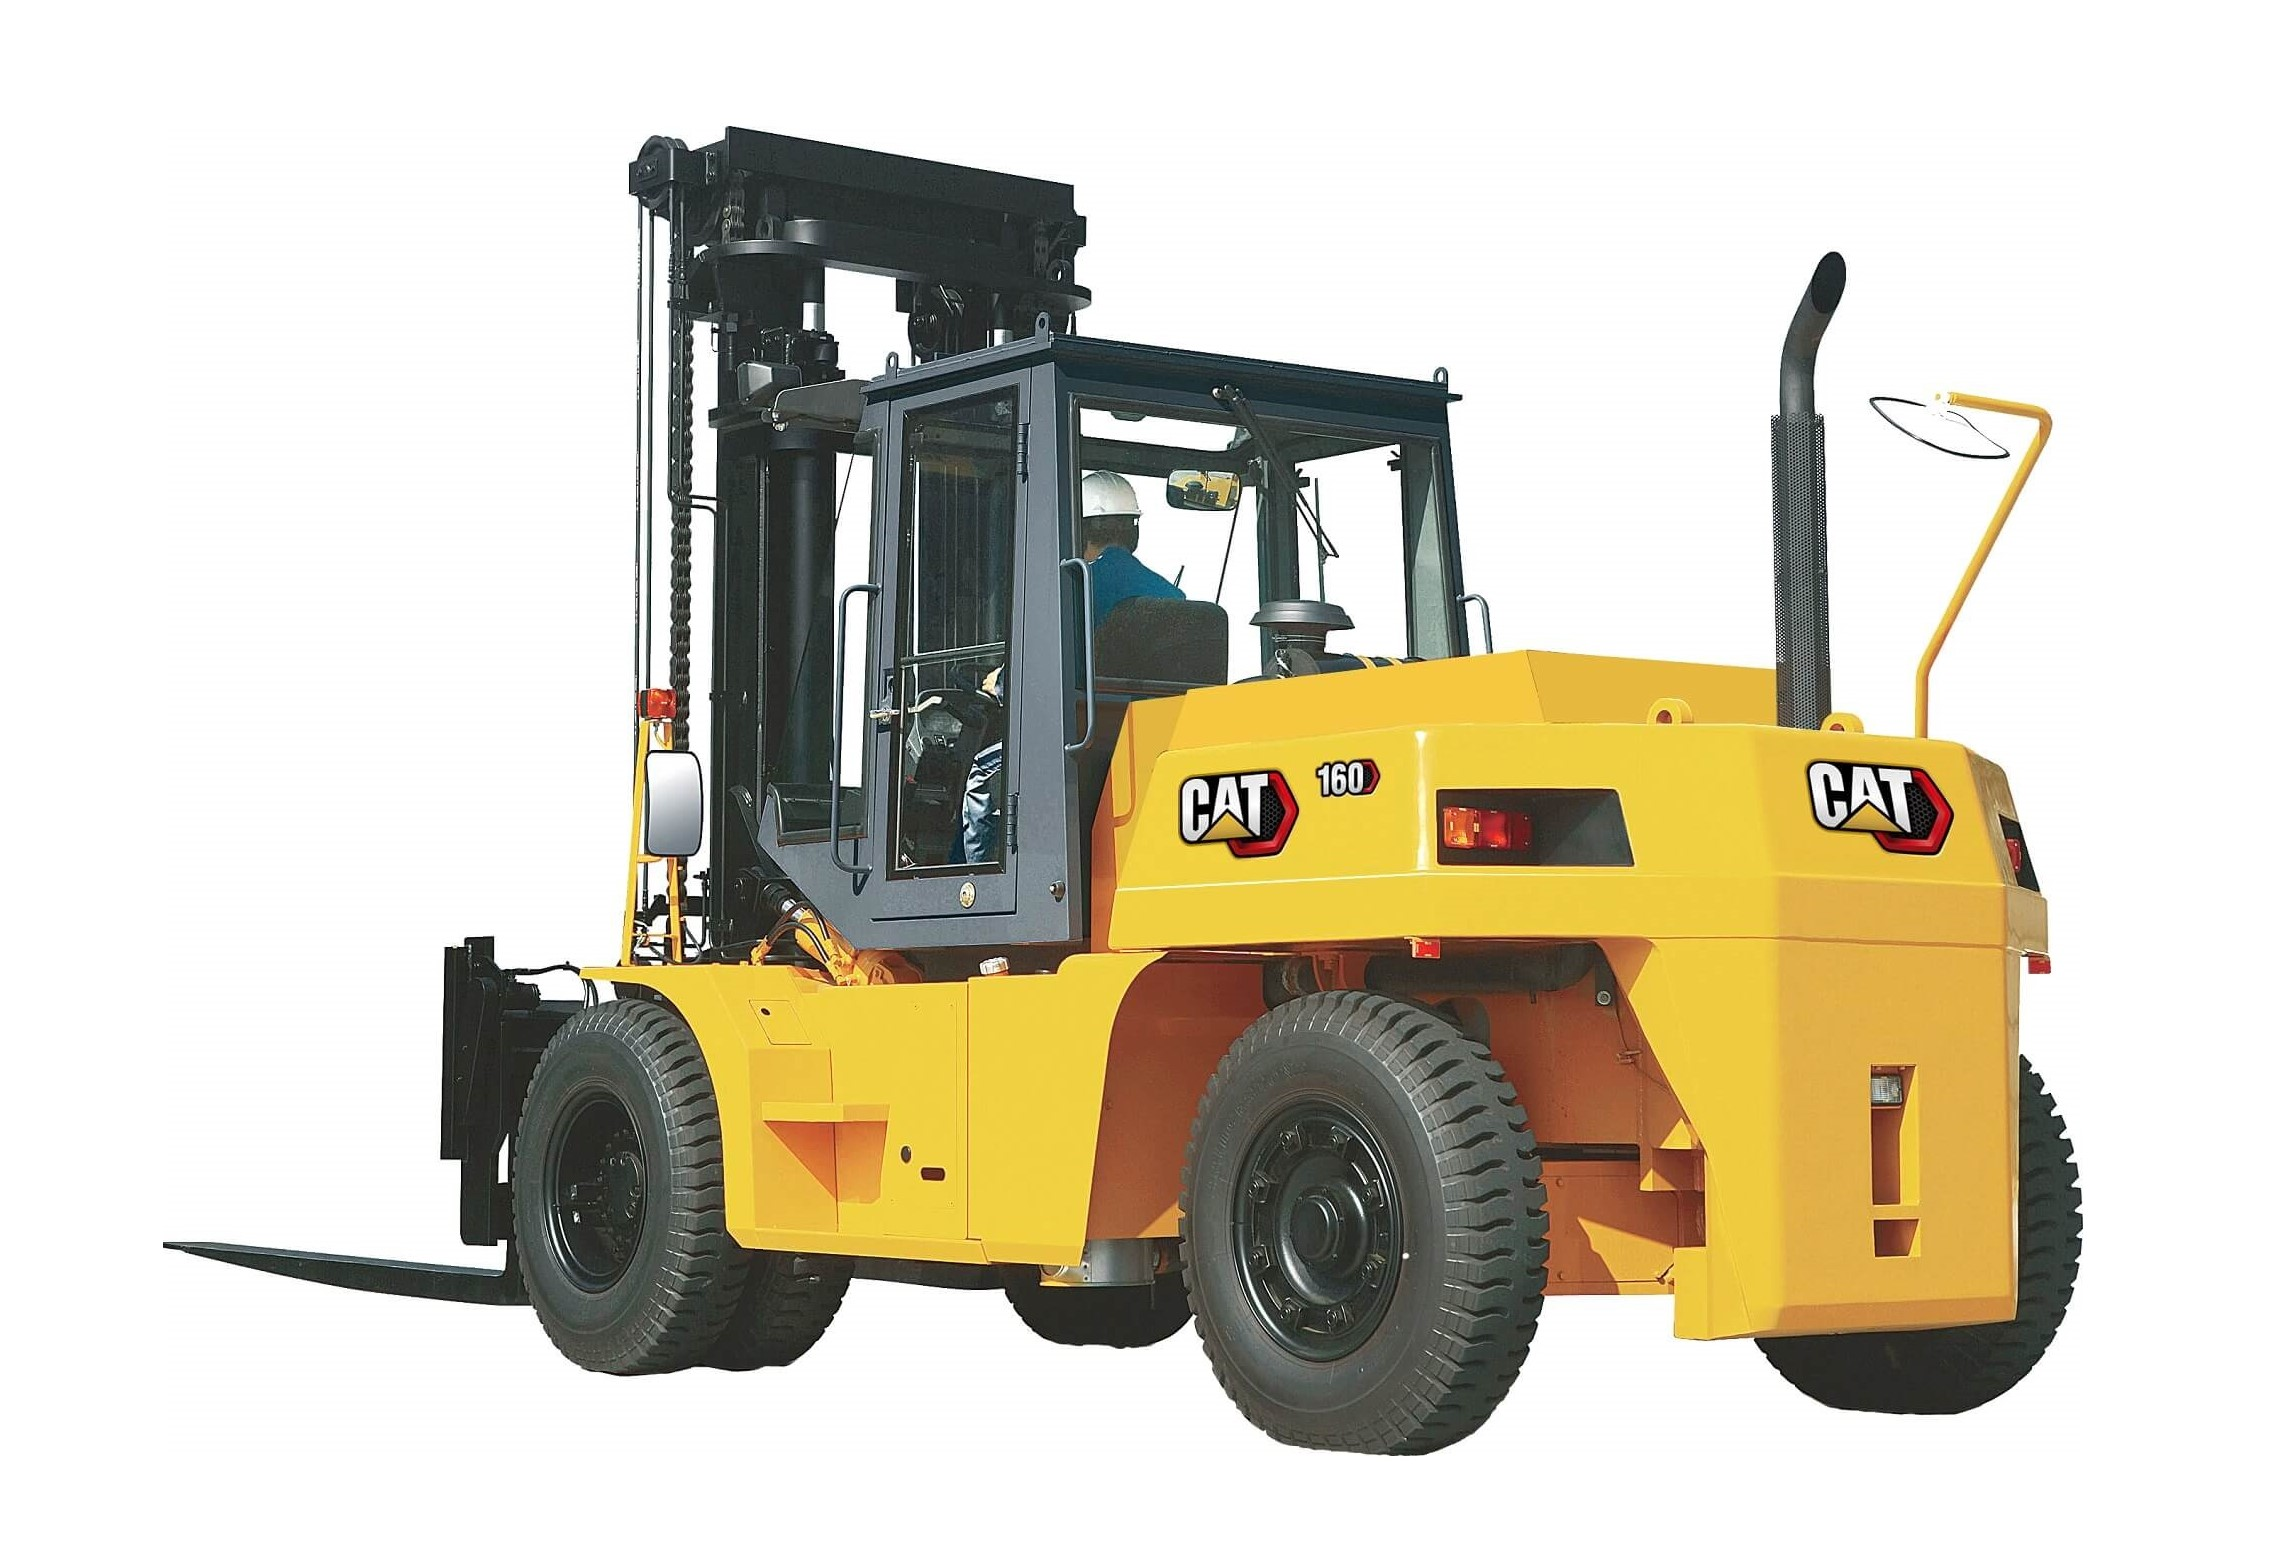 Cat DP100-160(S)NL - Phú Thái Cat